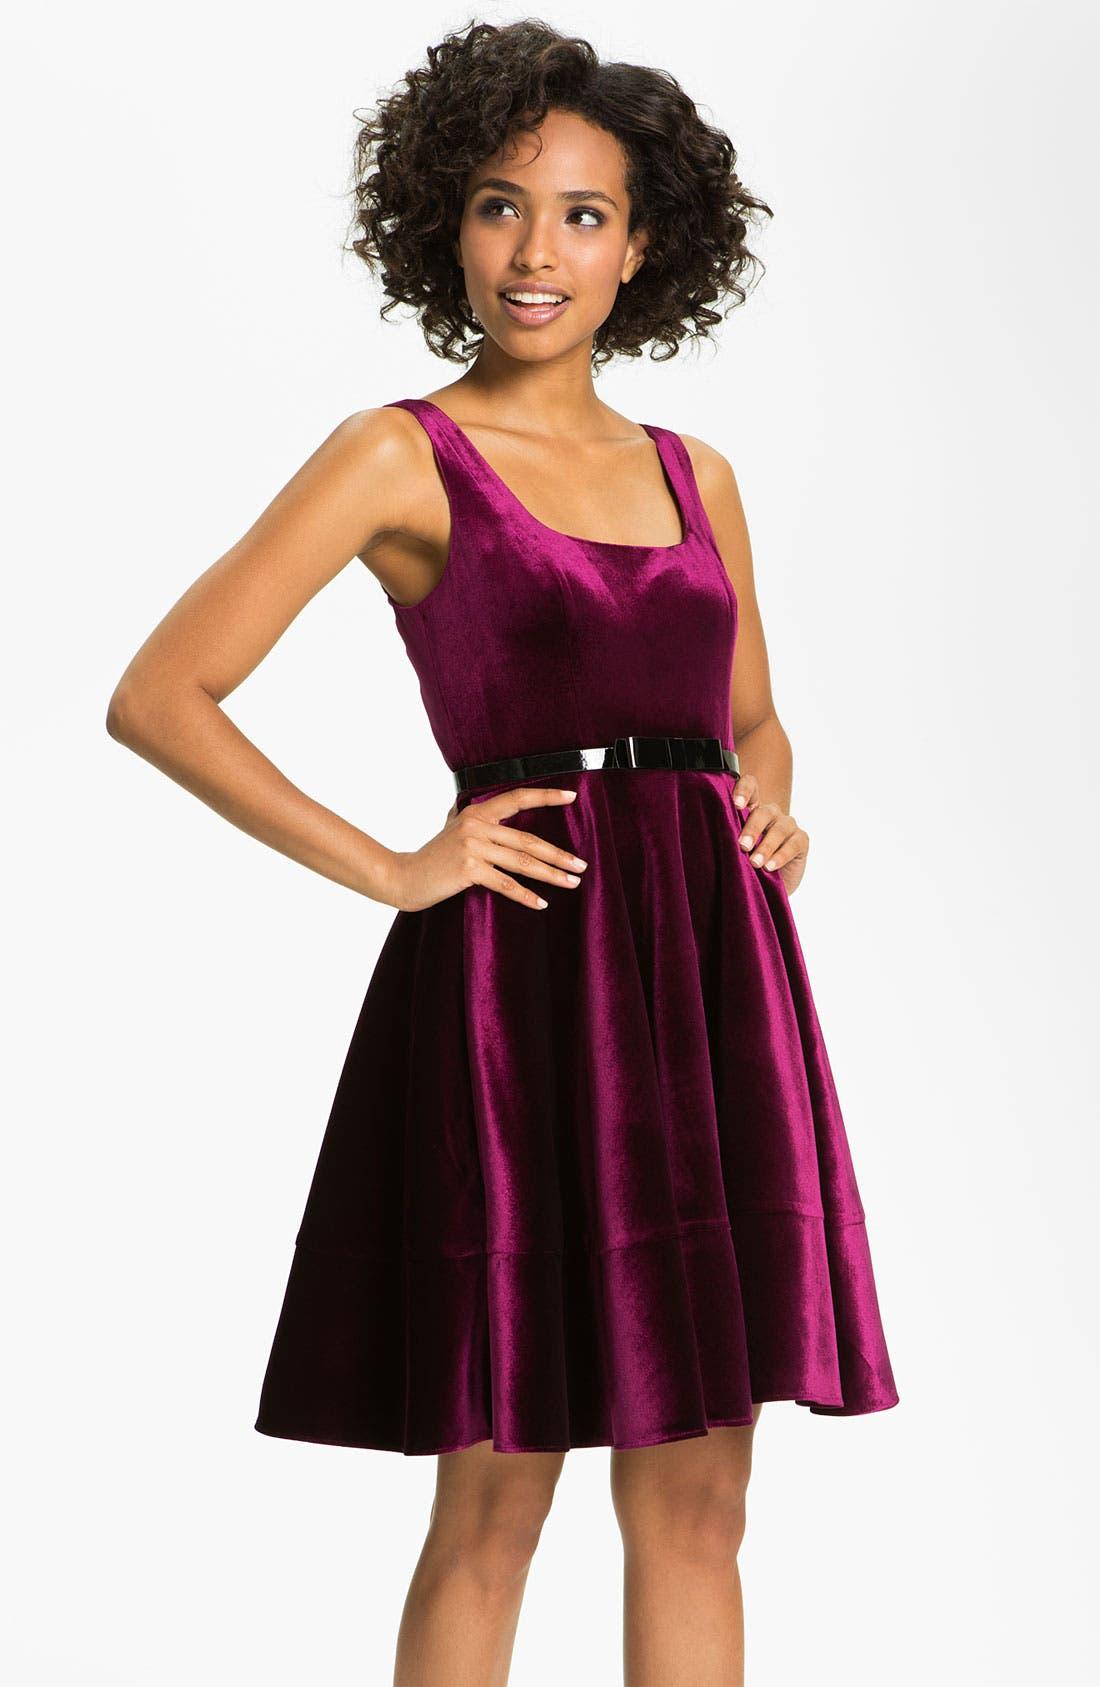 Main Image - Adrianna Papell Scoop Neck Velvet Fit & Flare Dress